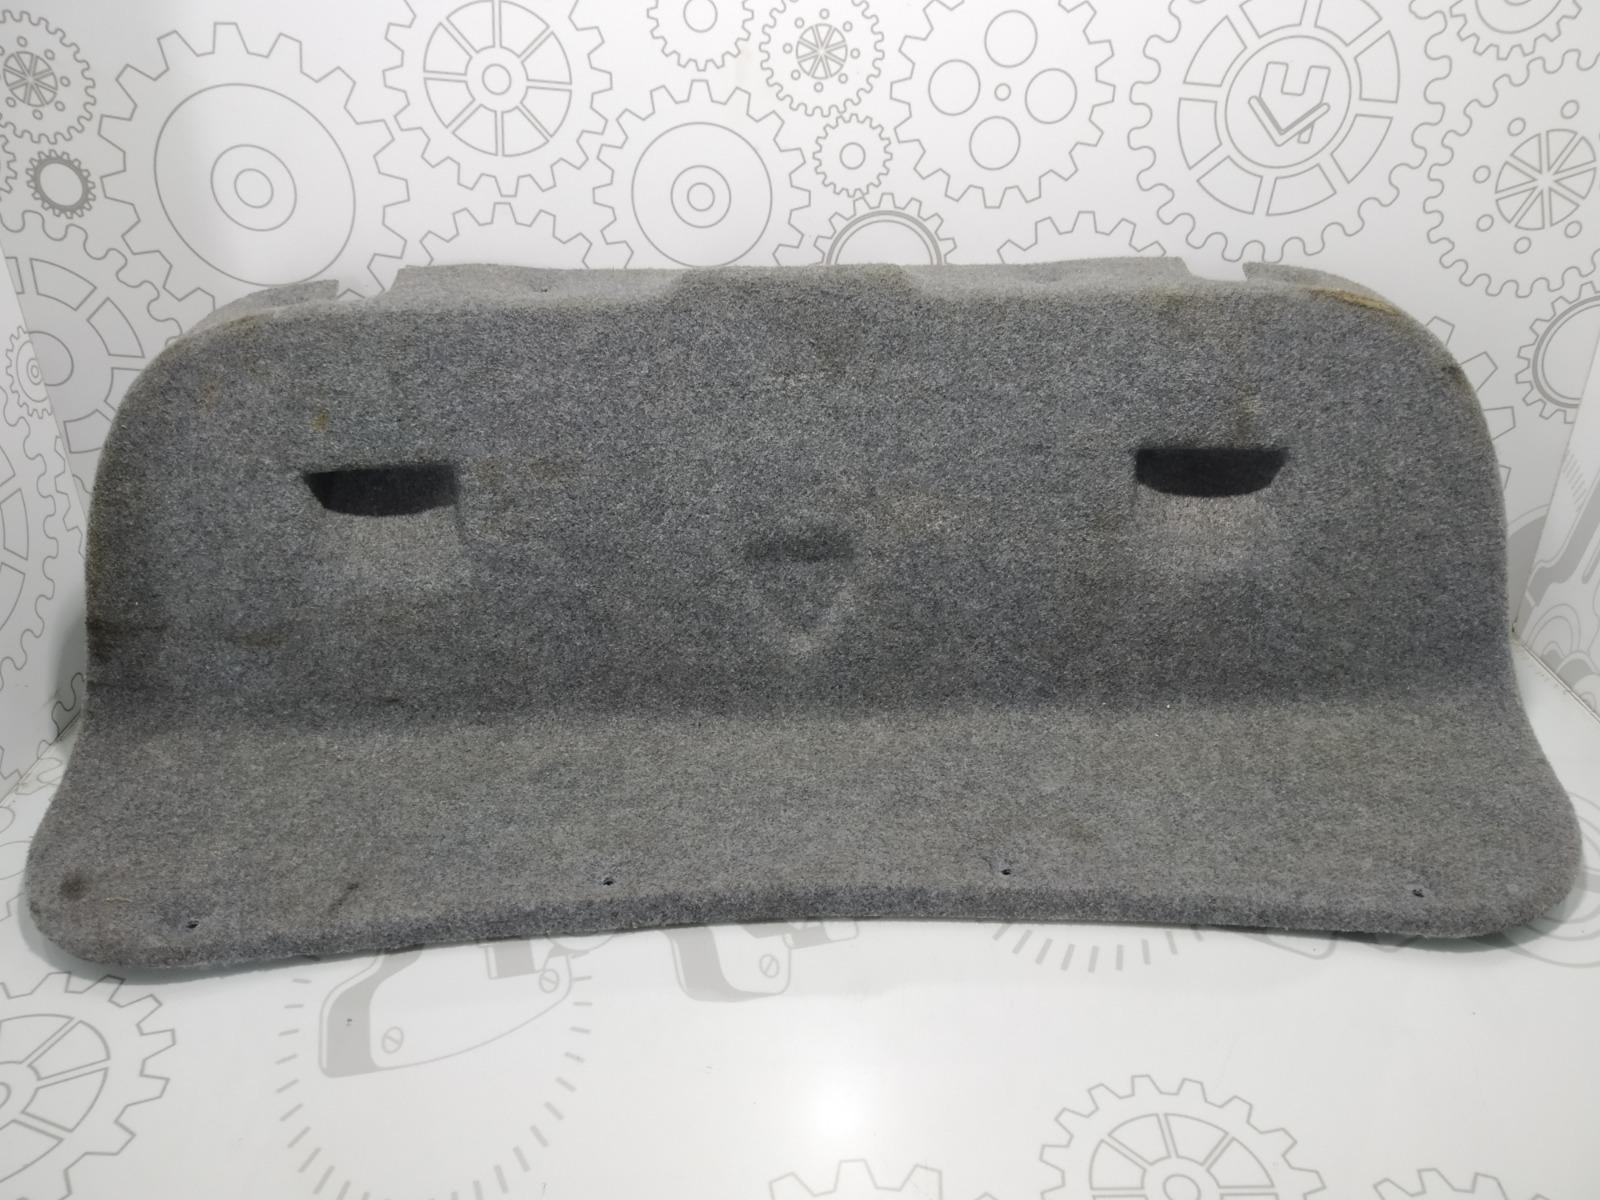 Обшивка крышки багажника Bmw 3 E90 2.0 I 2006 (б/у)